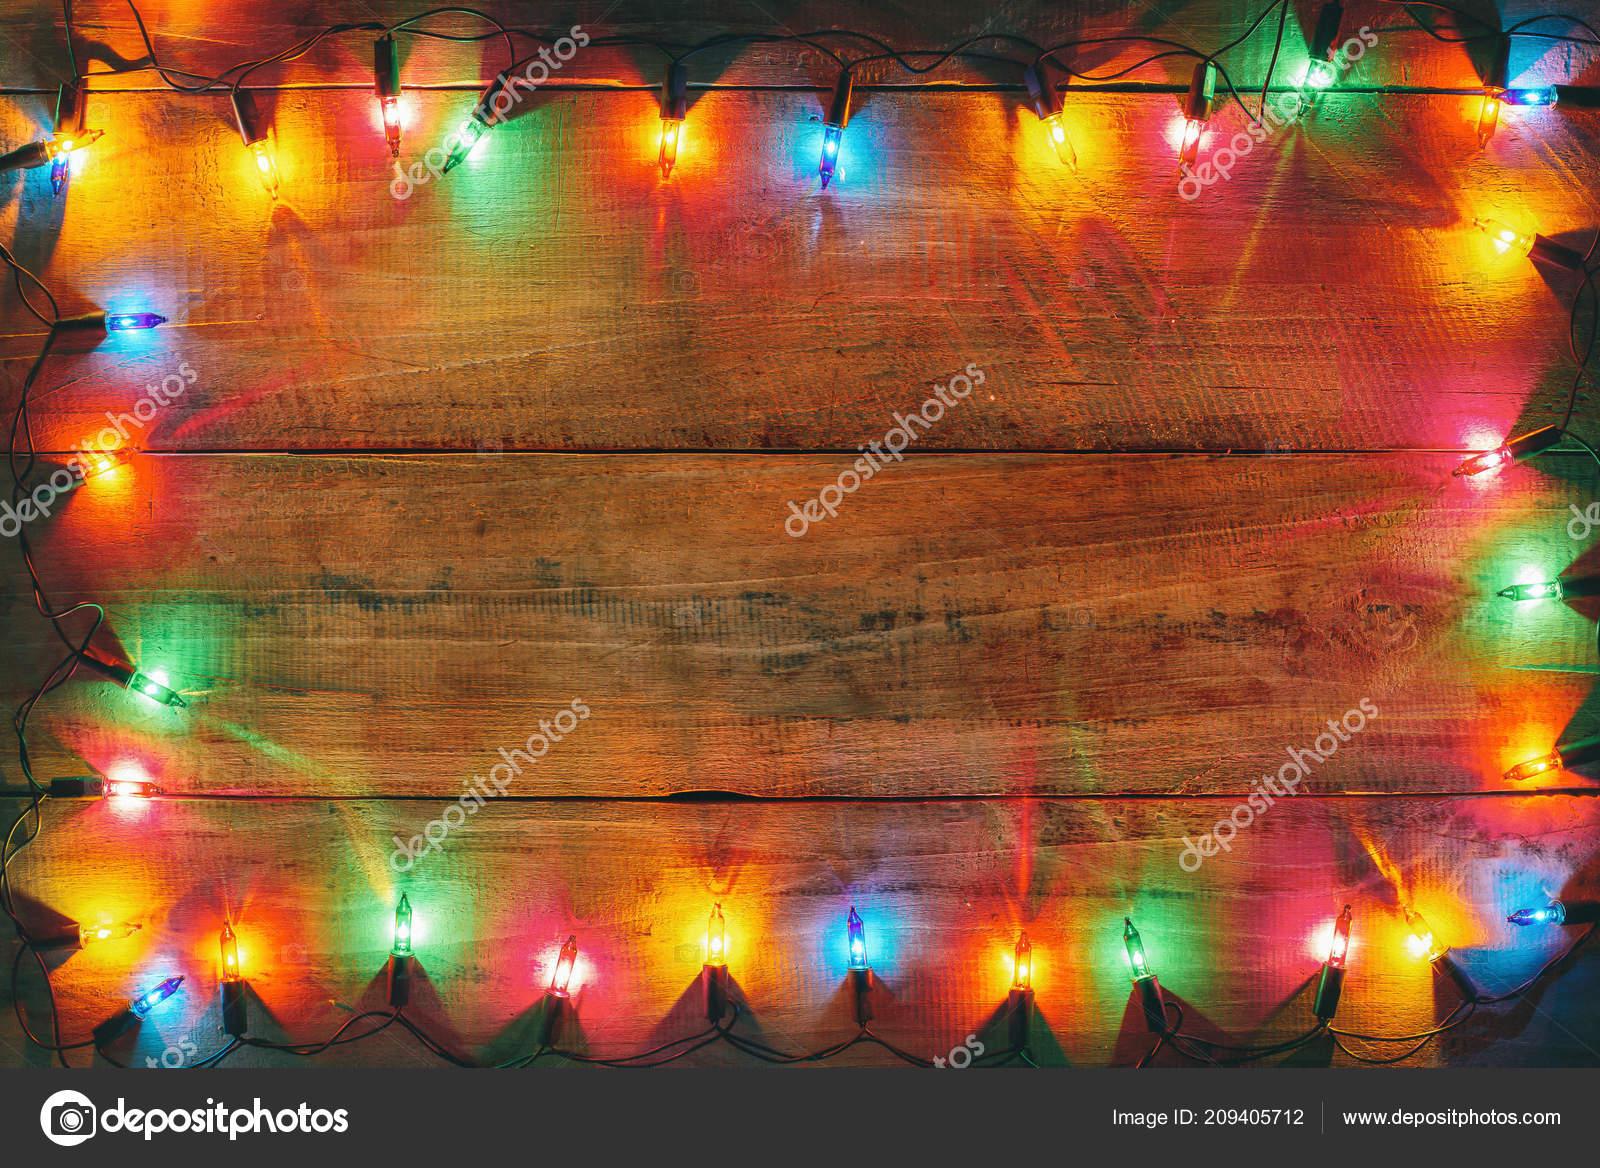 Vintage Christmas Lights.Vintage Christmas Lights Bulb Decoration Old Wood Plank